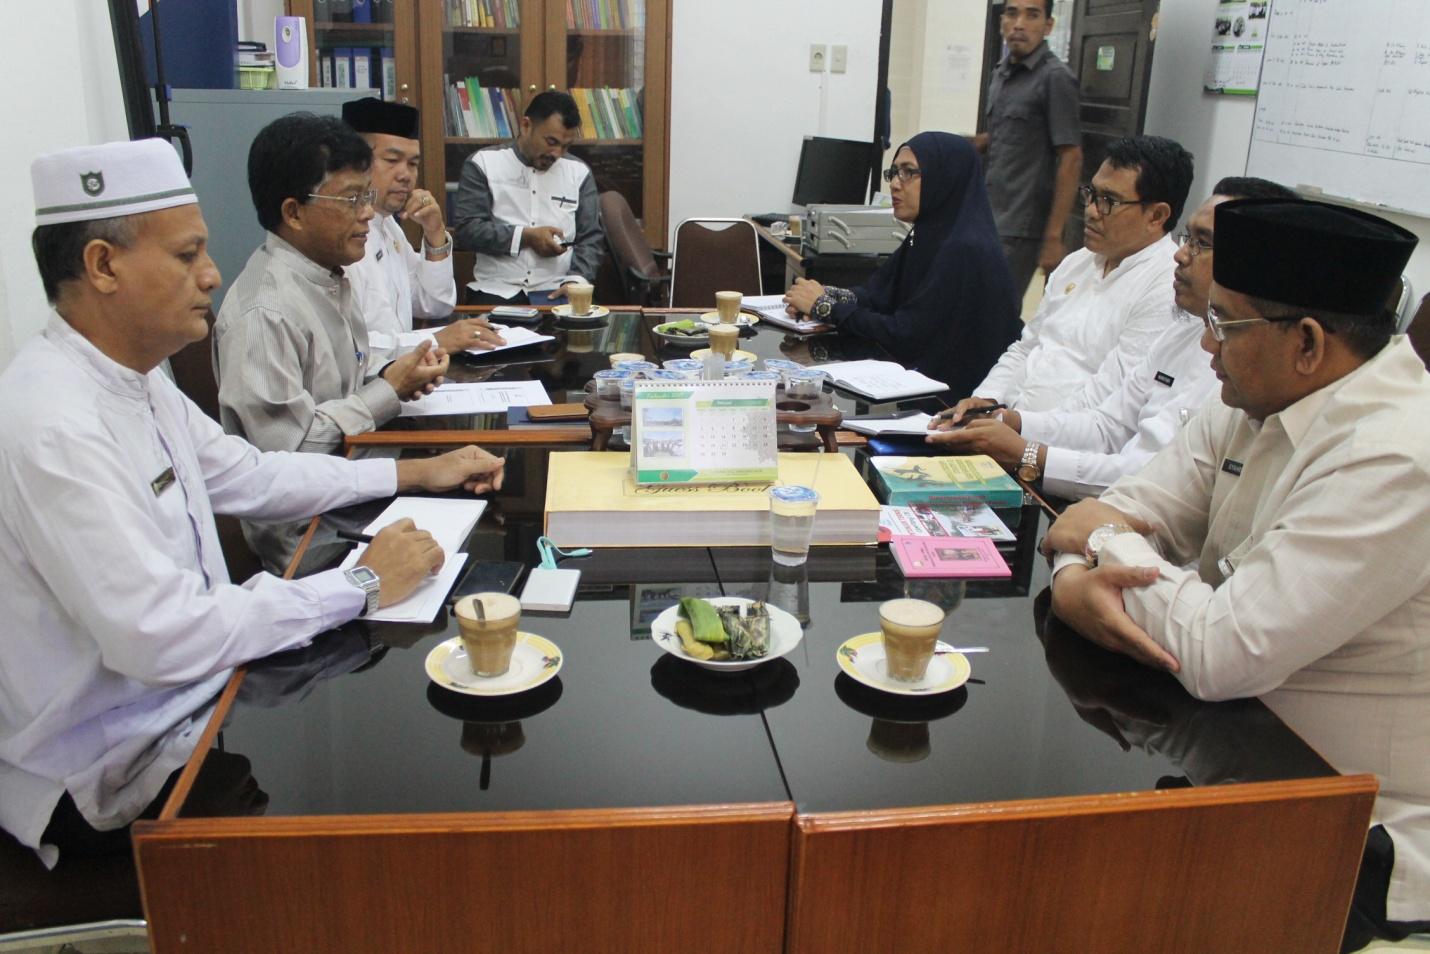 Bangun Keluarga Islami, BKKBN dan DSI Aceh Siap Komitmen